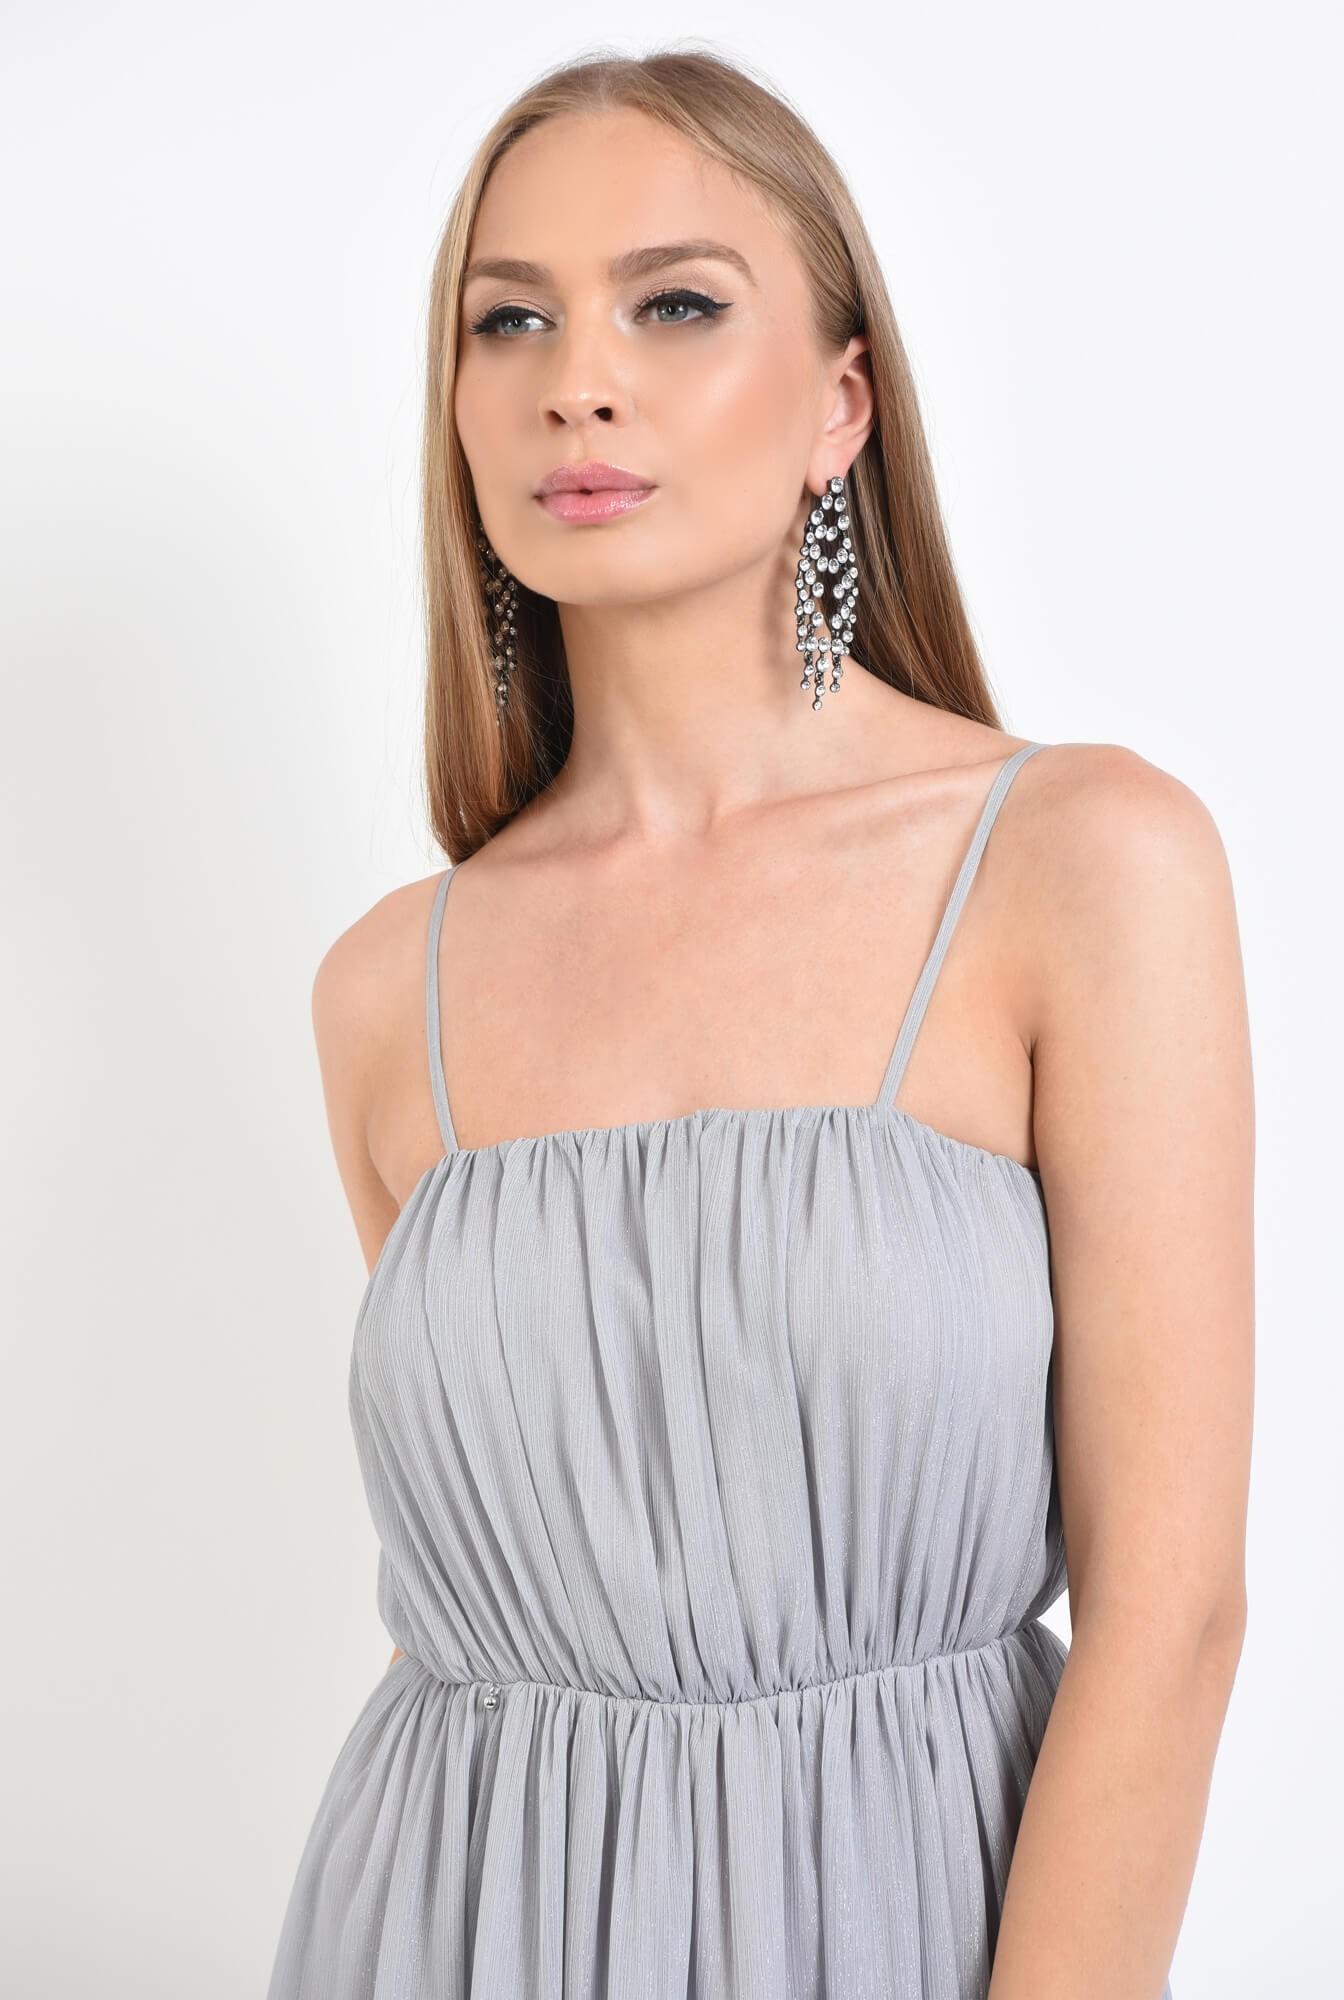 2 - rochie de seara, pliuri, argintiu, lunga, voal